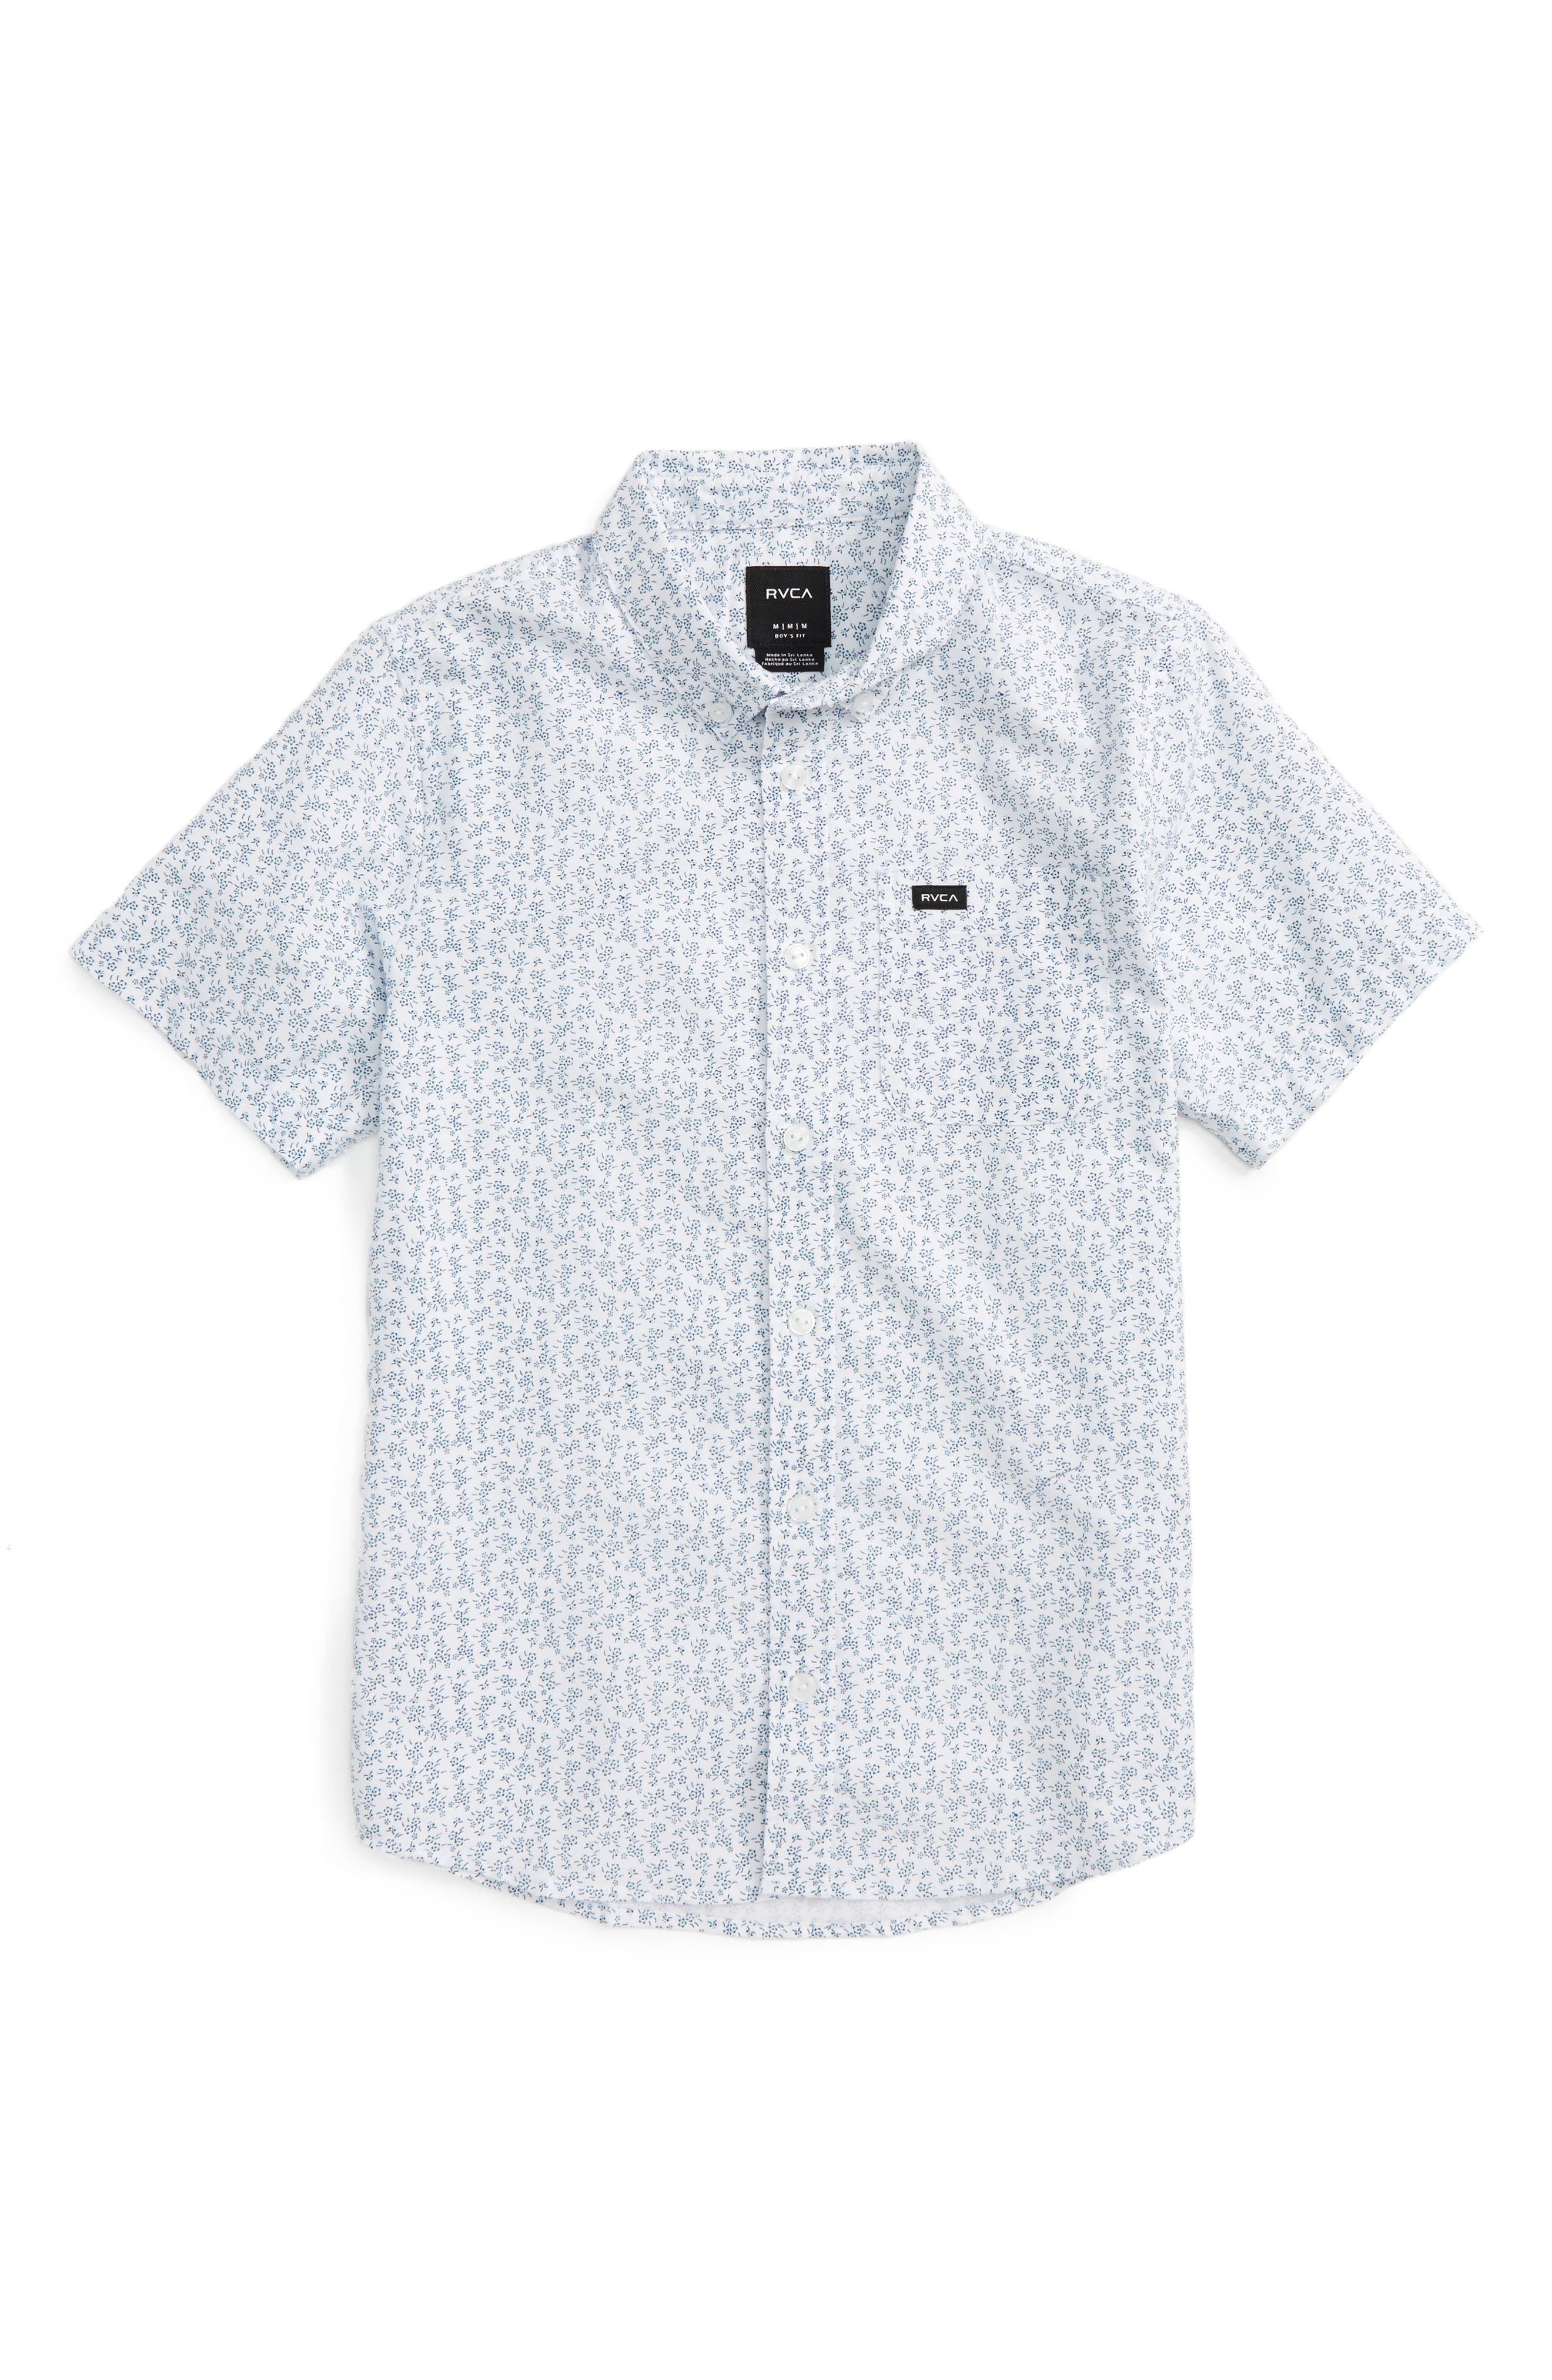 RVCA That'll Do Floral Print Woven Shirt (Big Boys)